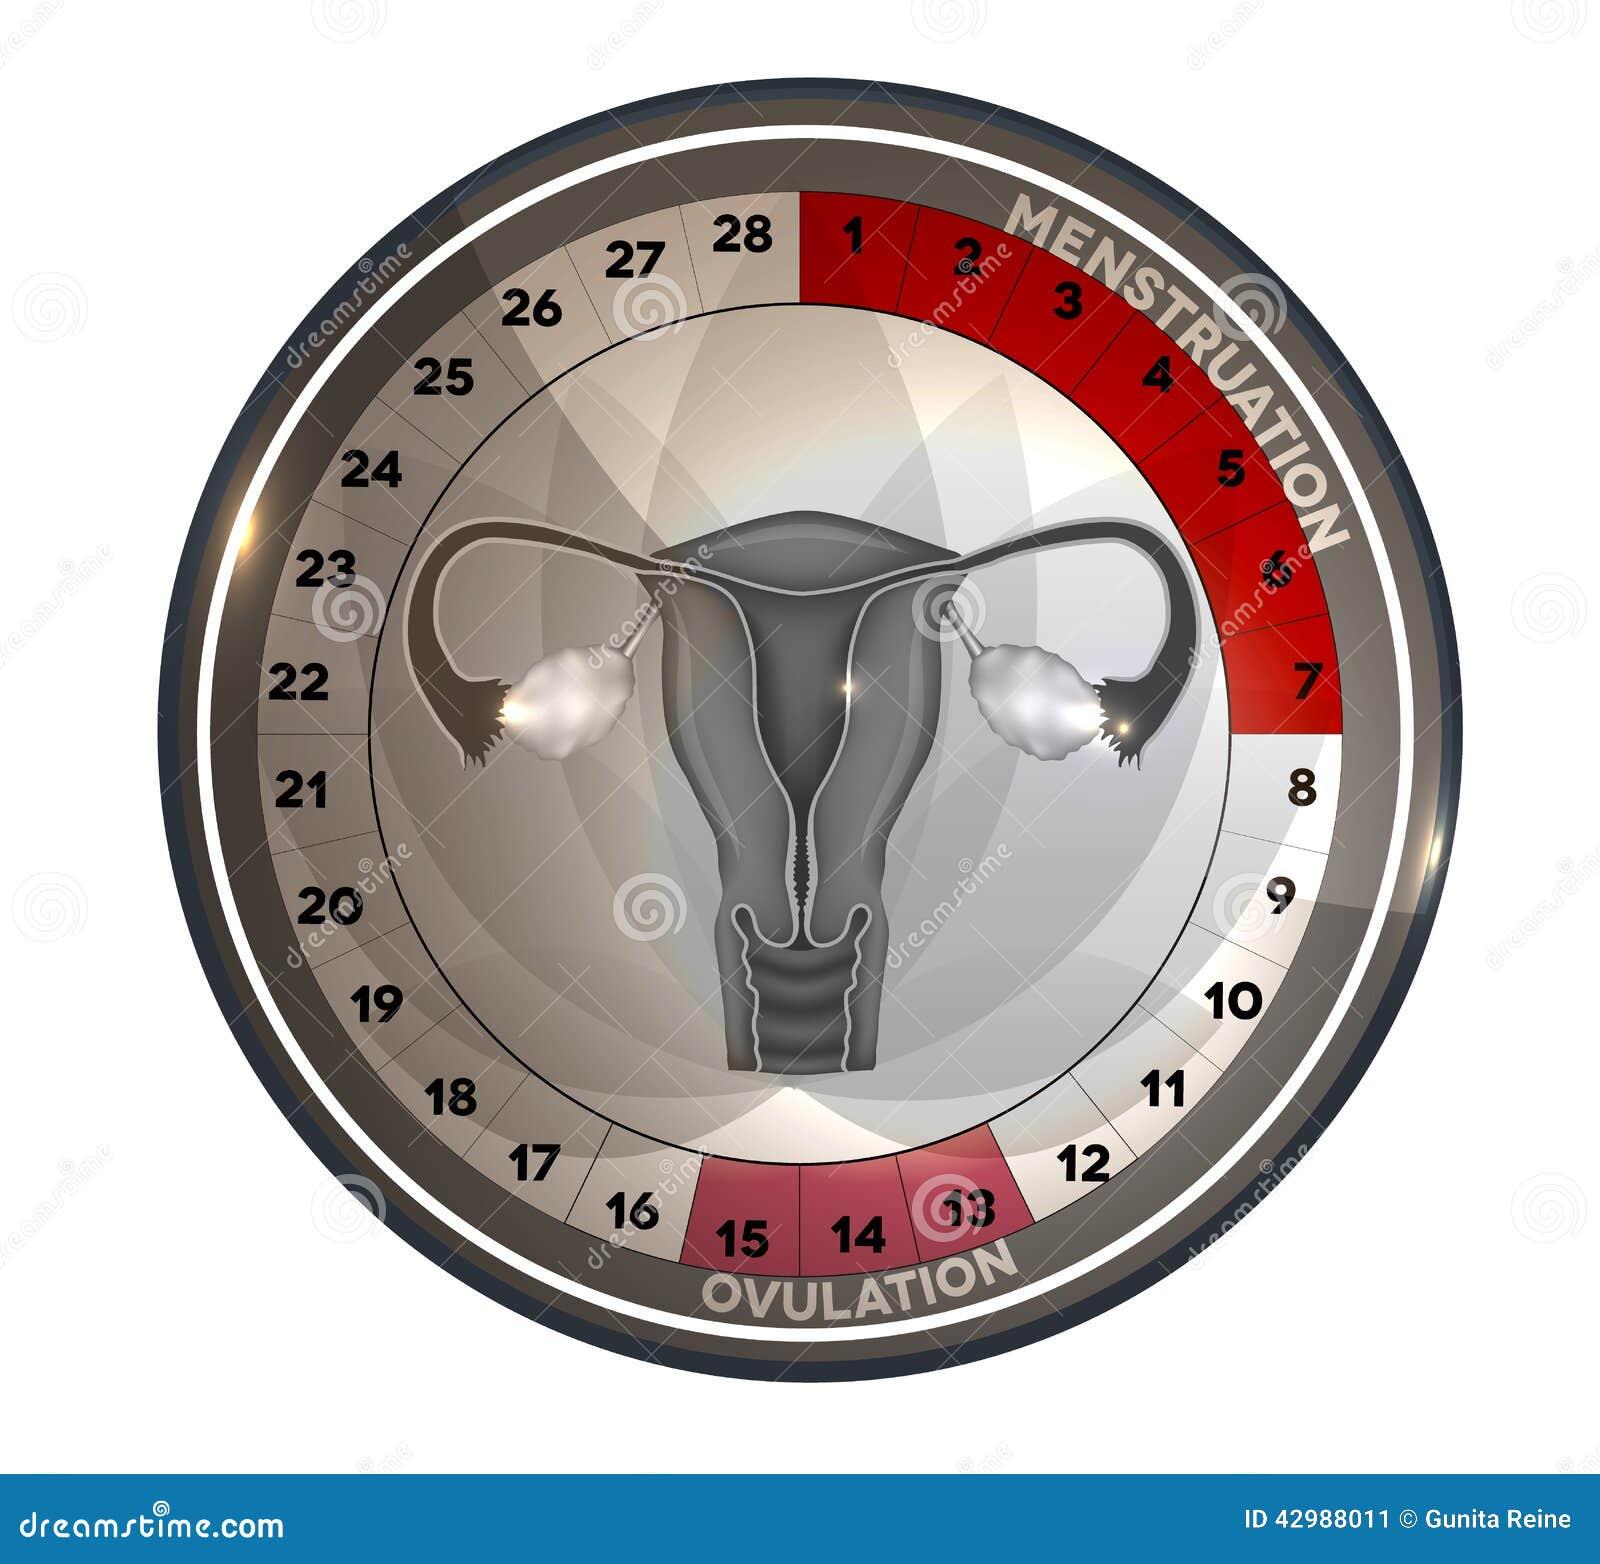 Menstrual cycle calendar reproductive system